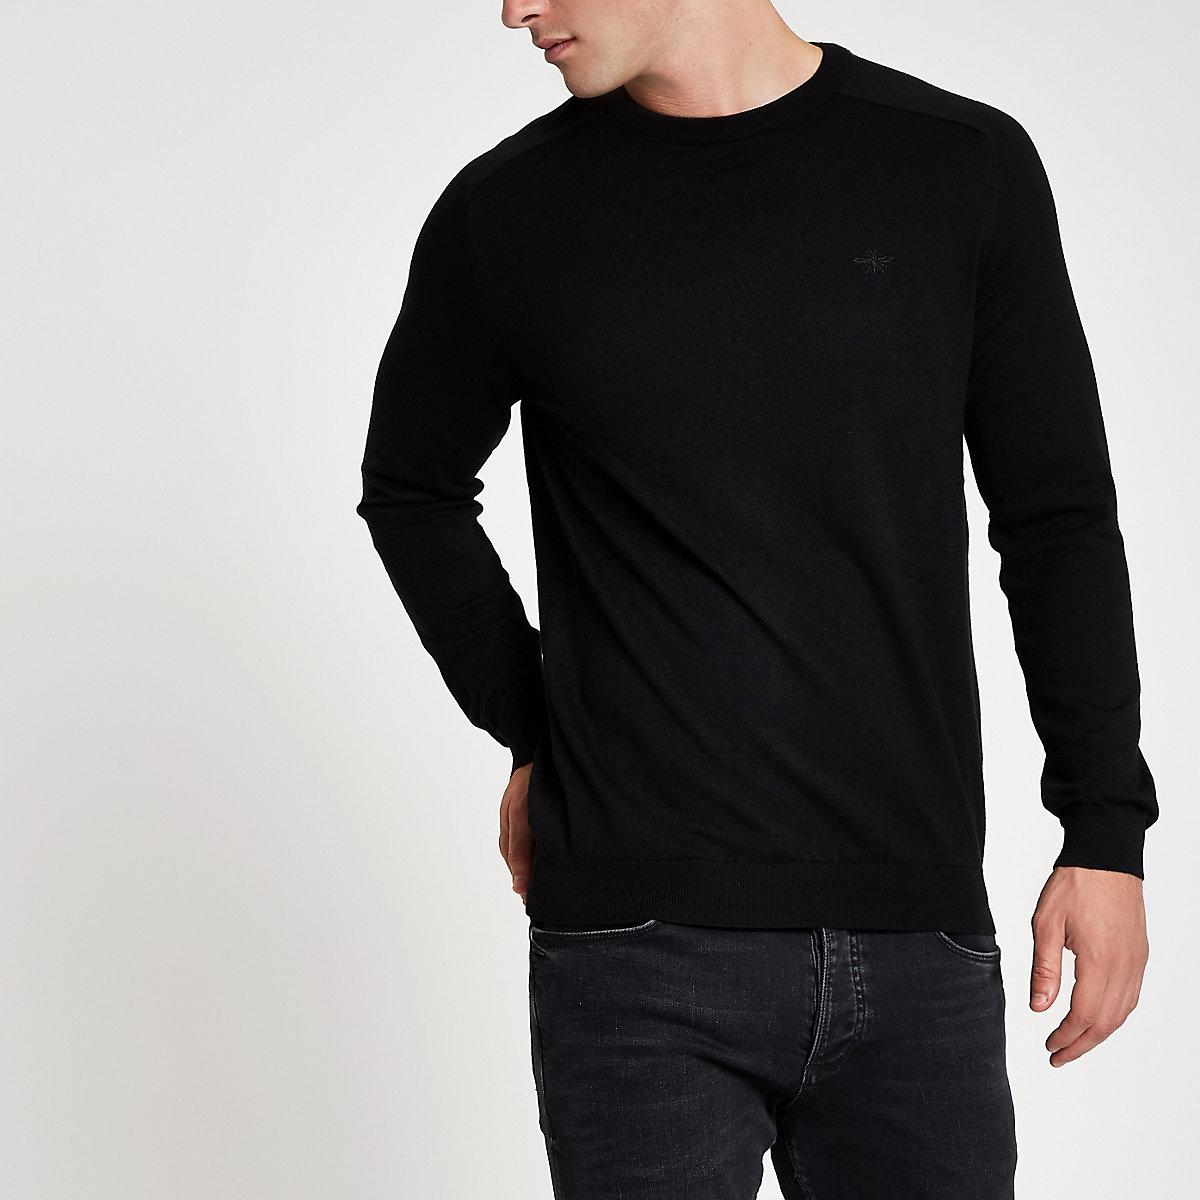 Black slim fit crew neck jumper